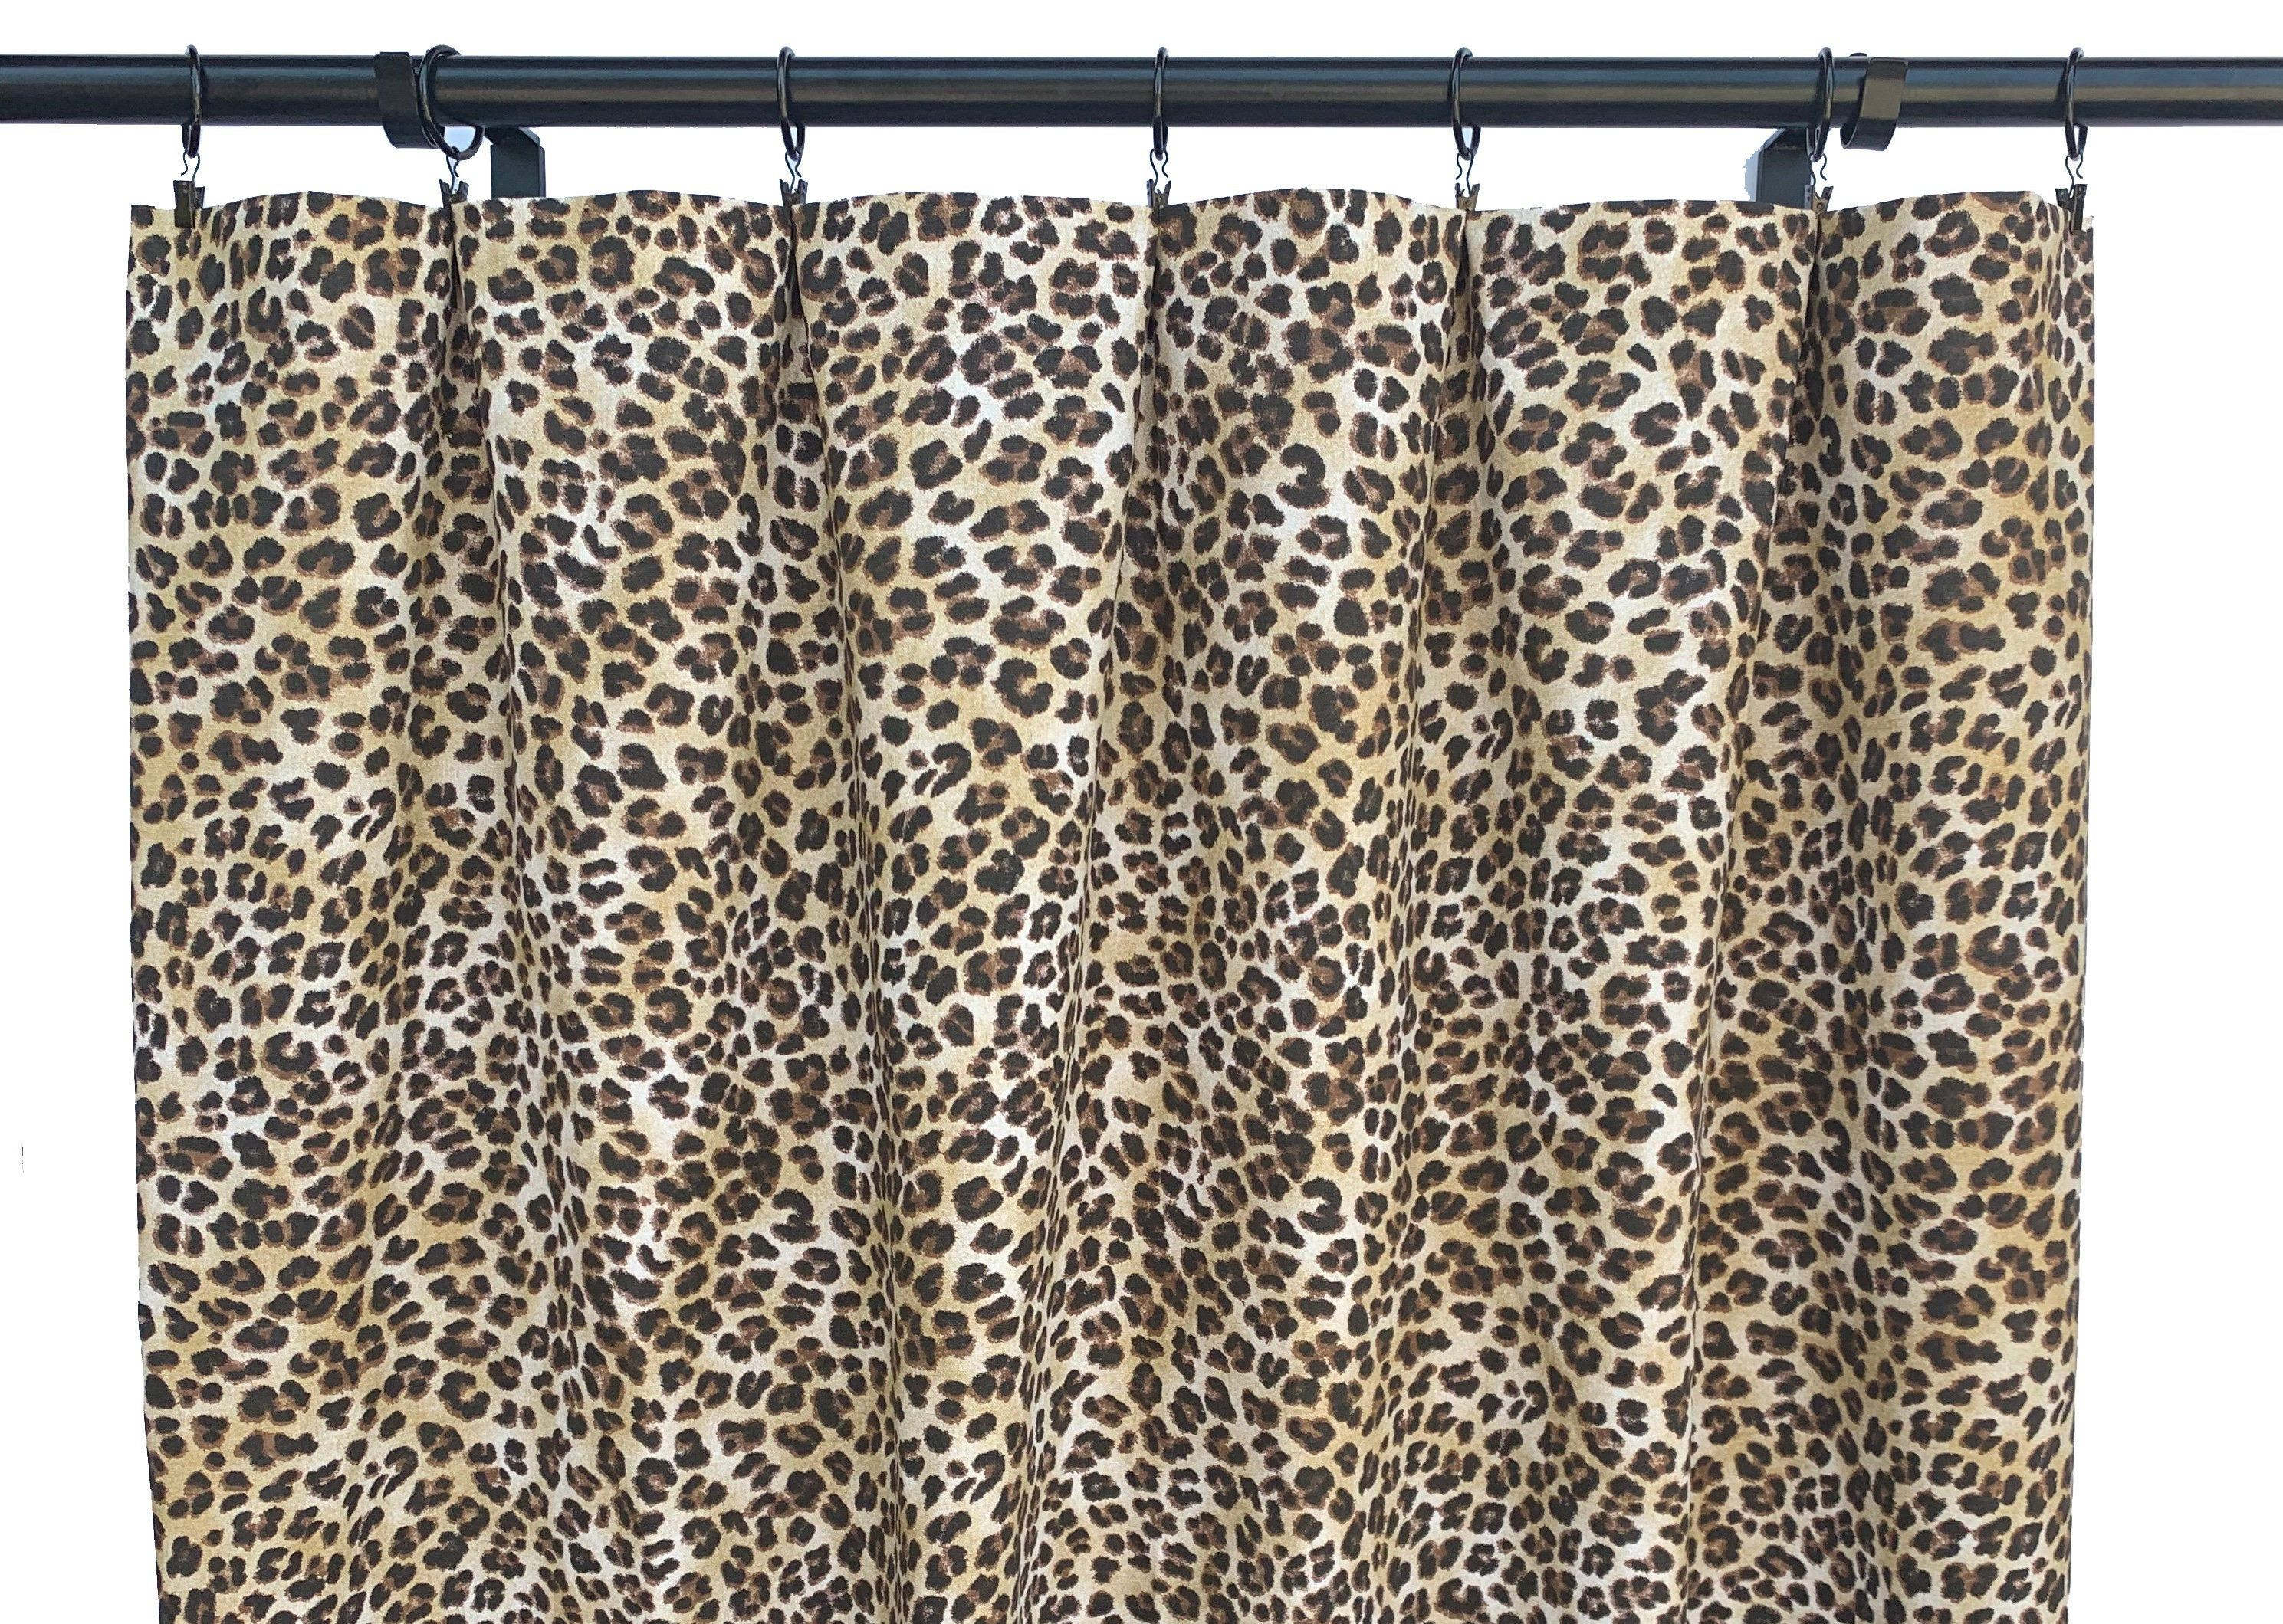 Pin On Leopard Print Bedroom